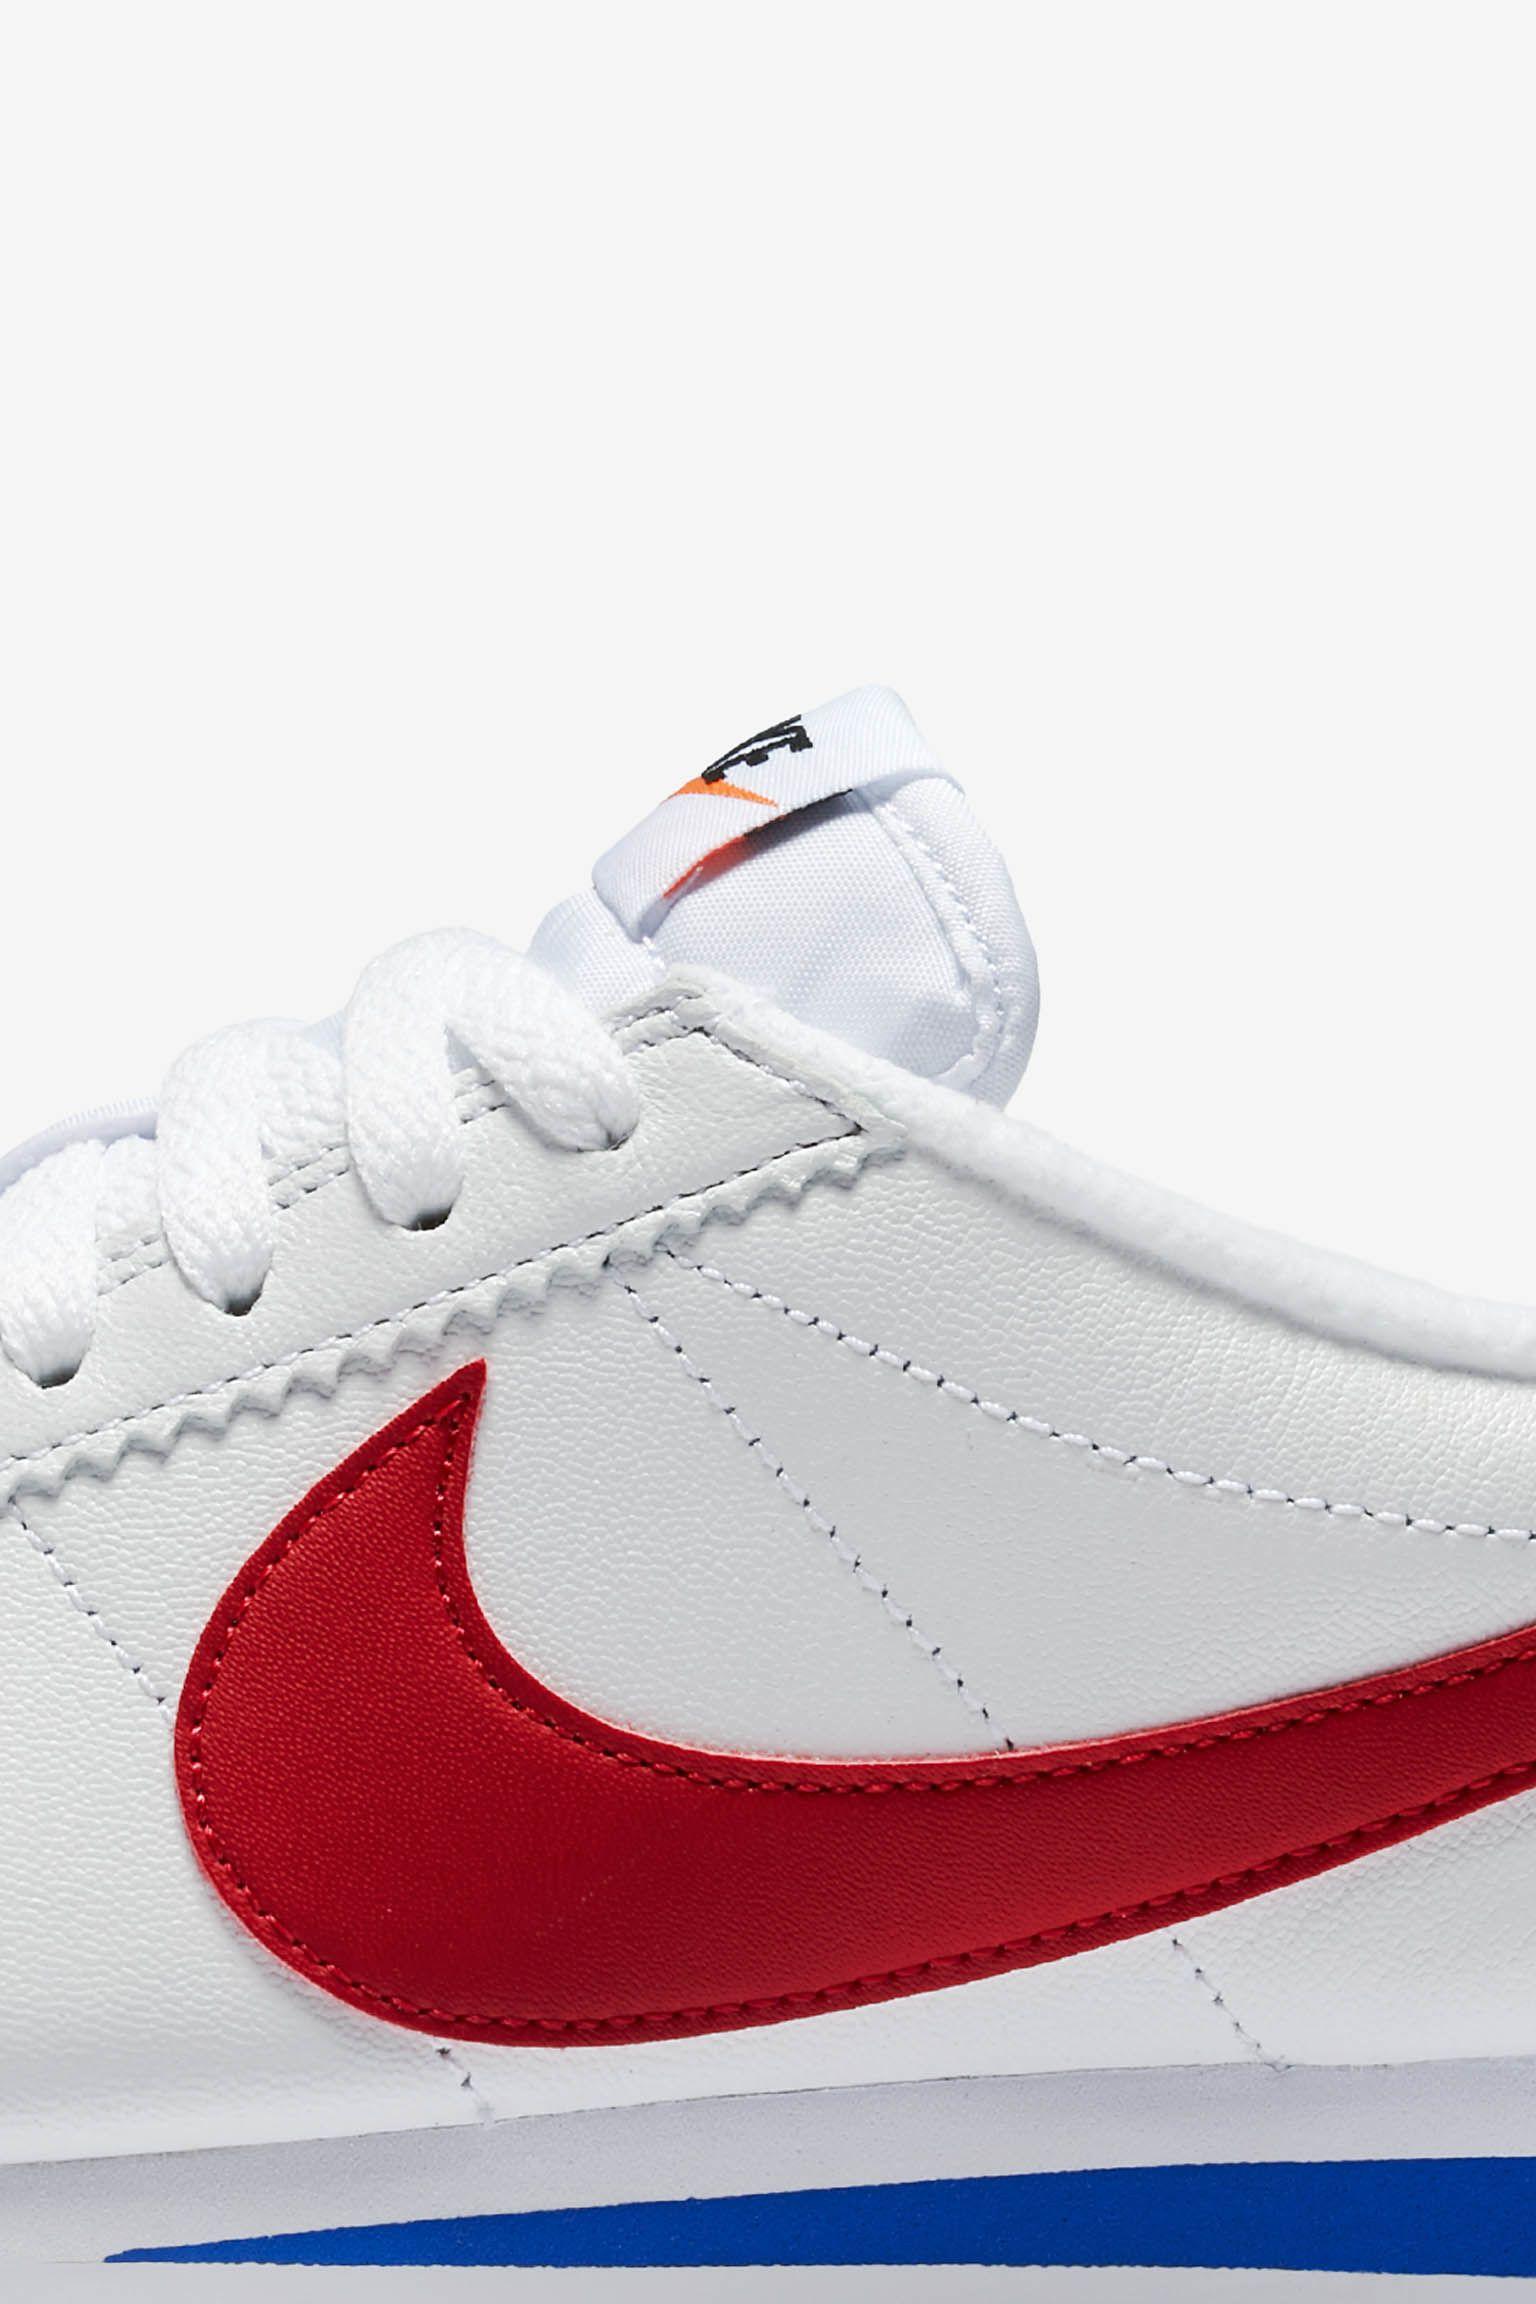 Women's Nike Classic Cortez Premium 'White & Varsity Royal & Varsity Red' Release Date